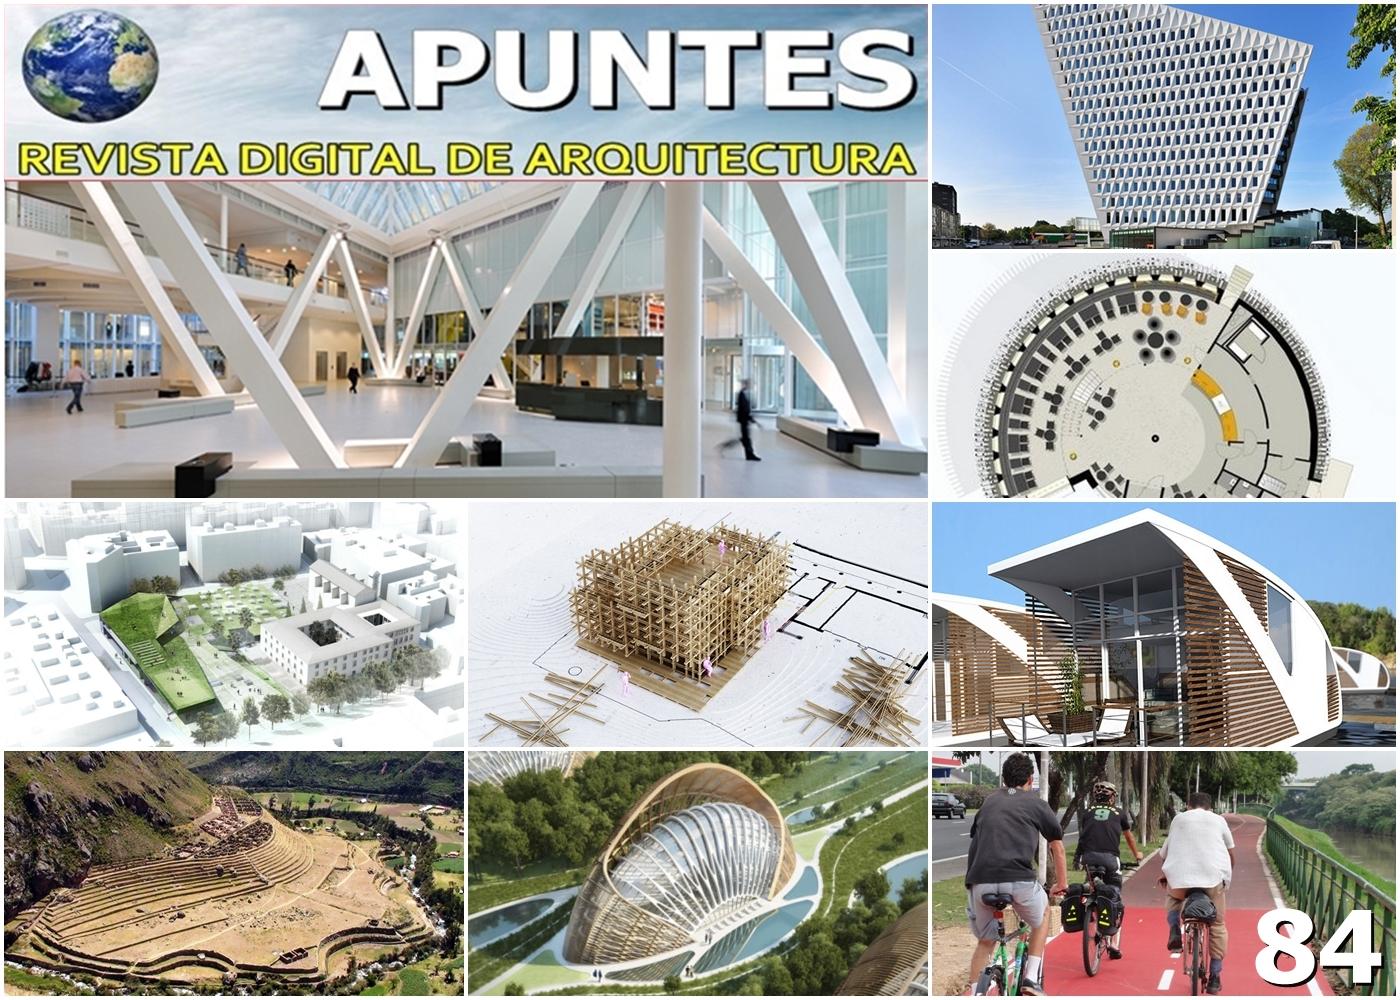 Apuntes Revista Digital De Arquitectura Abril 2016